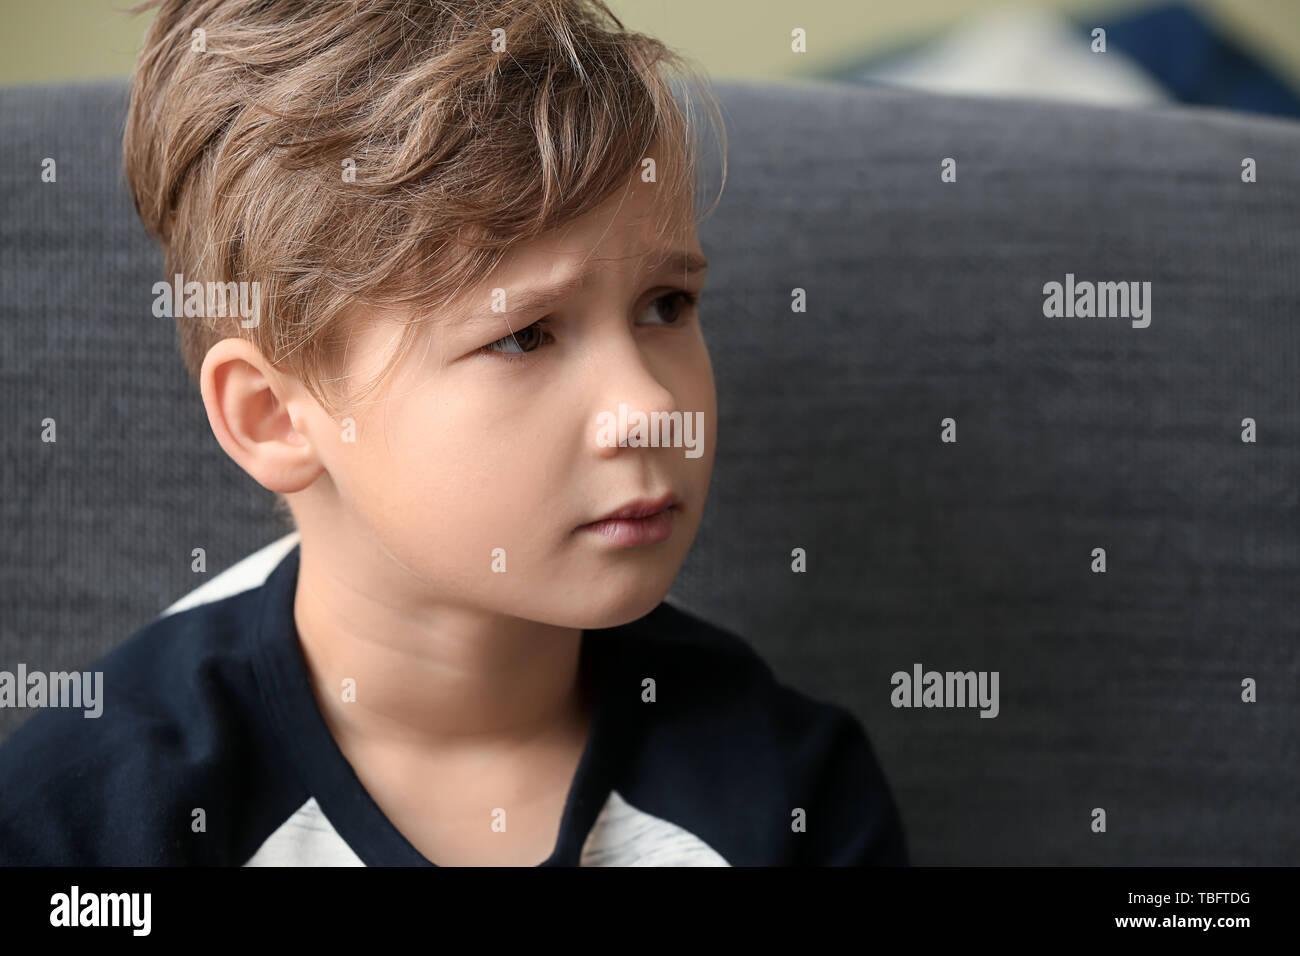 Sad little boy indoors - Stock Image